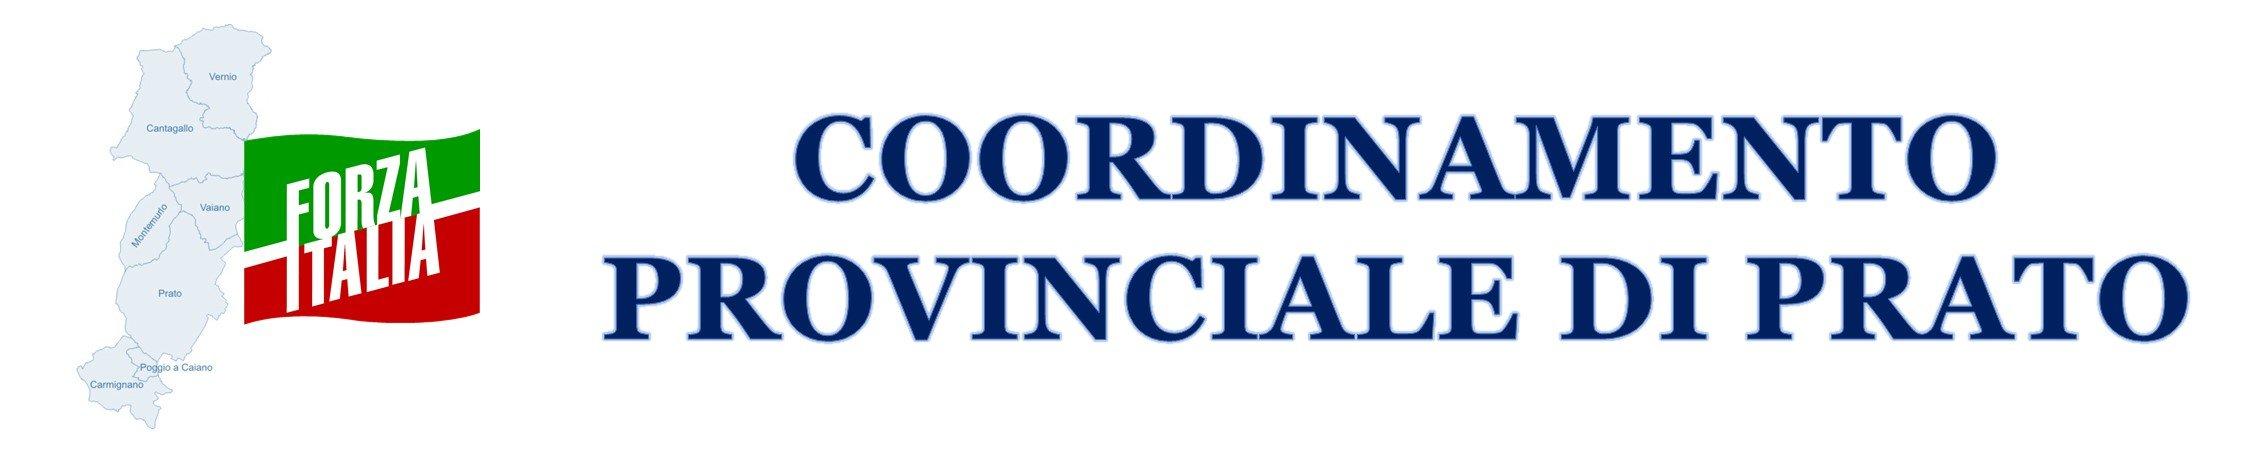 Coordinamento provinciale Prato